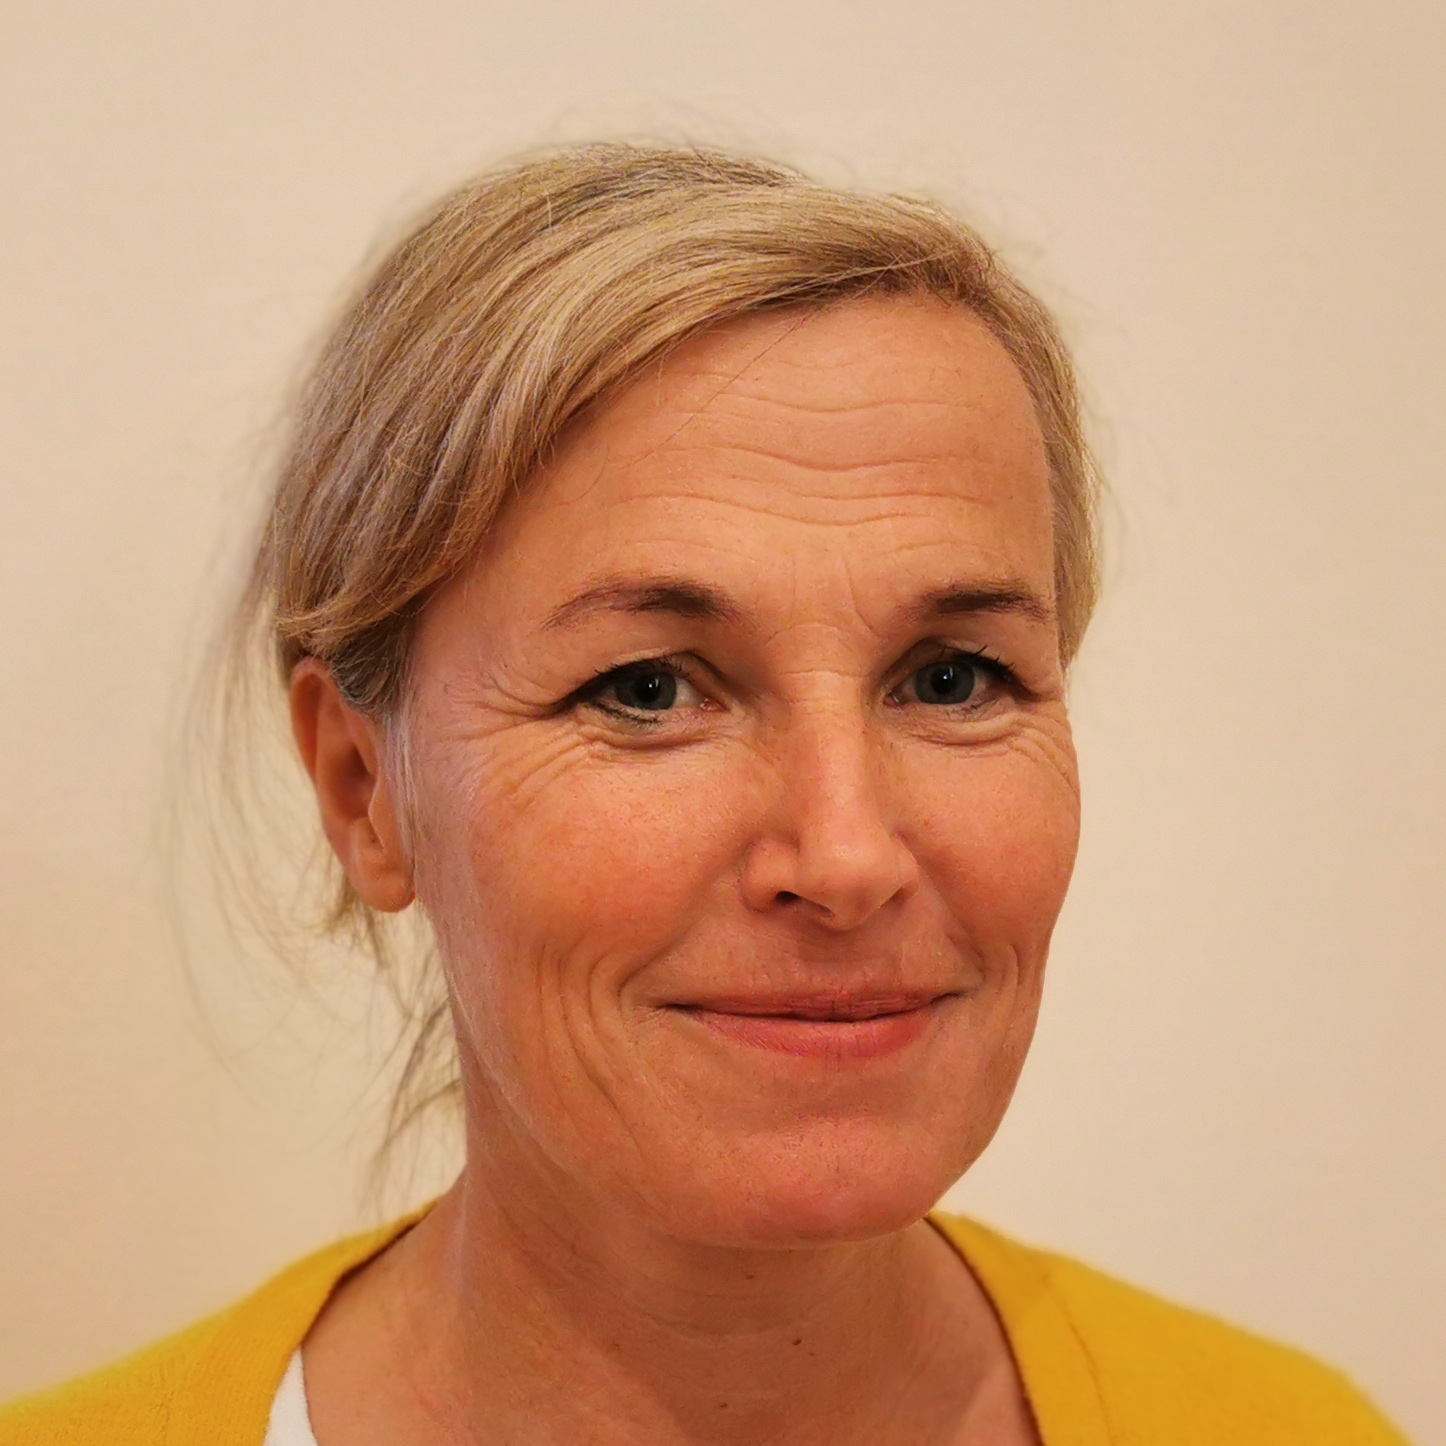 Christa Hölzl